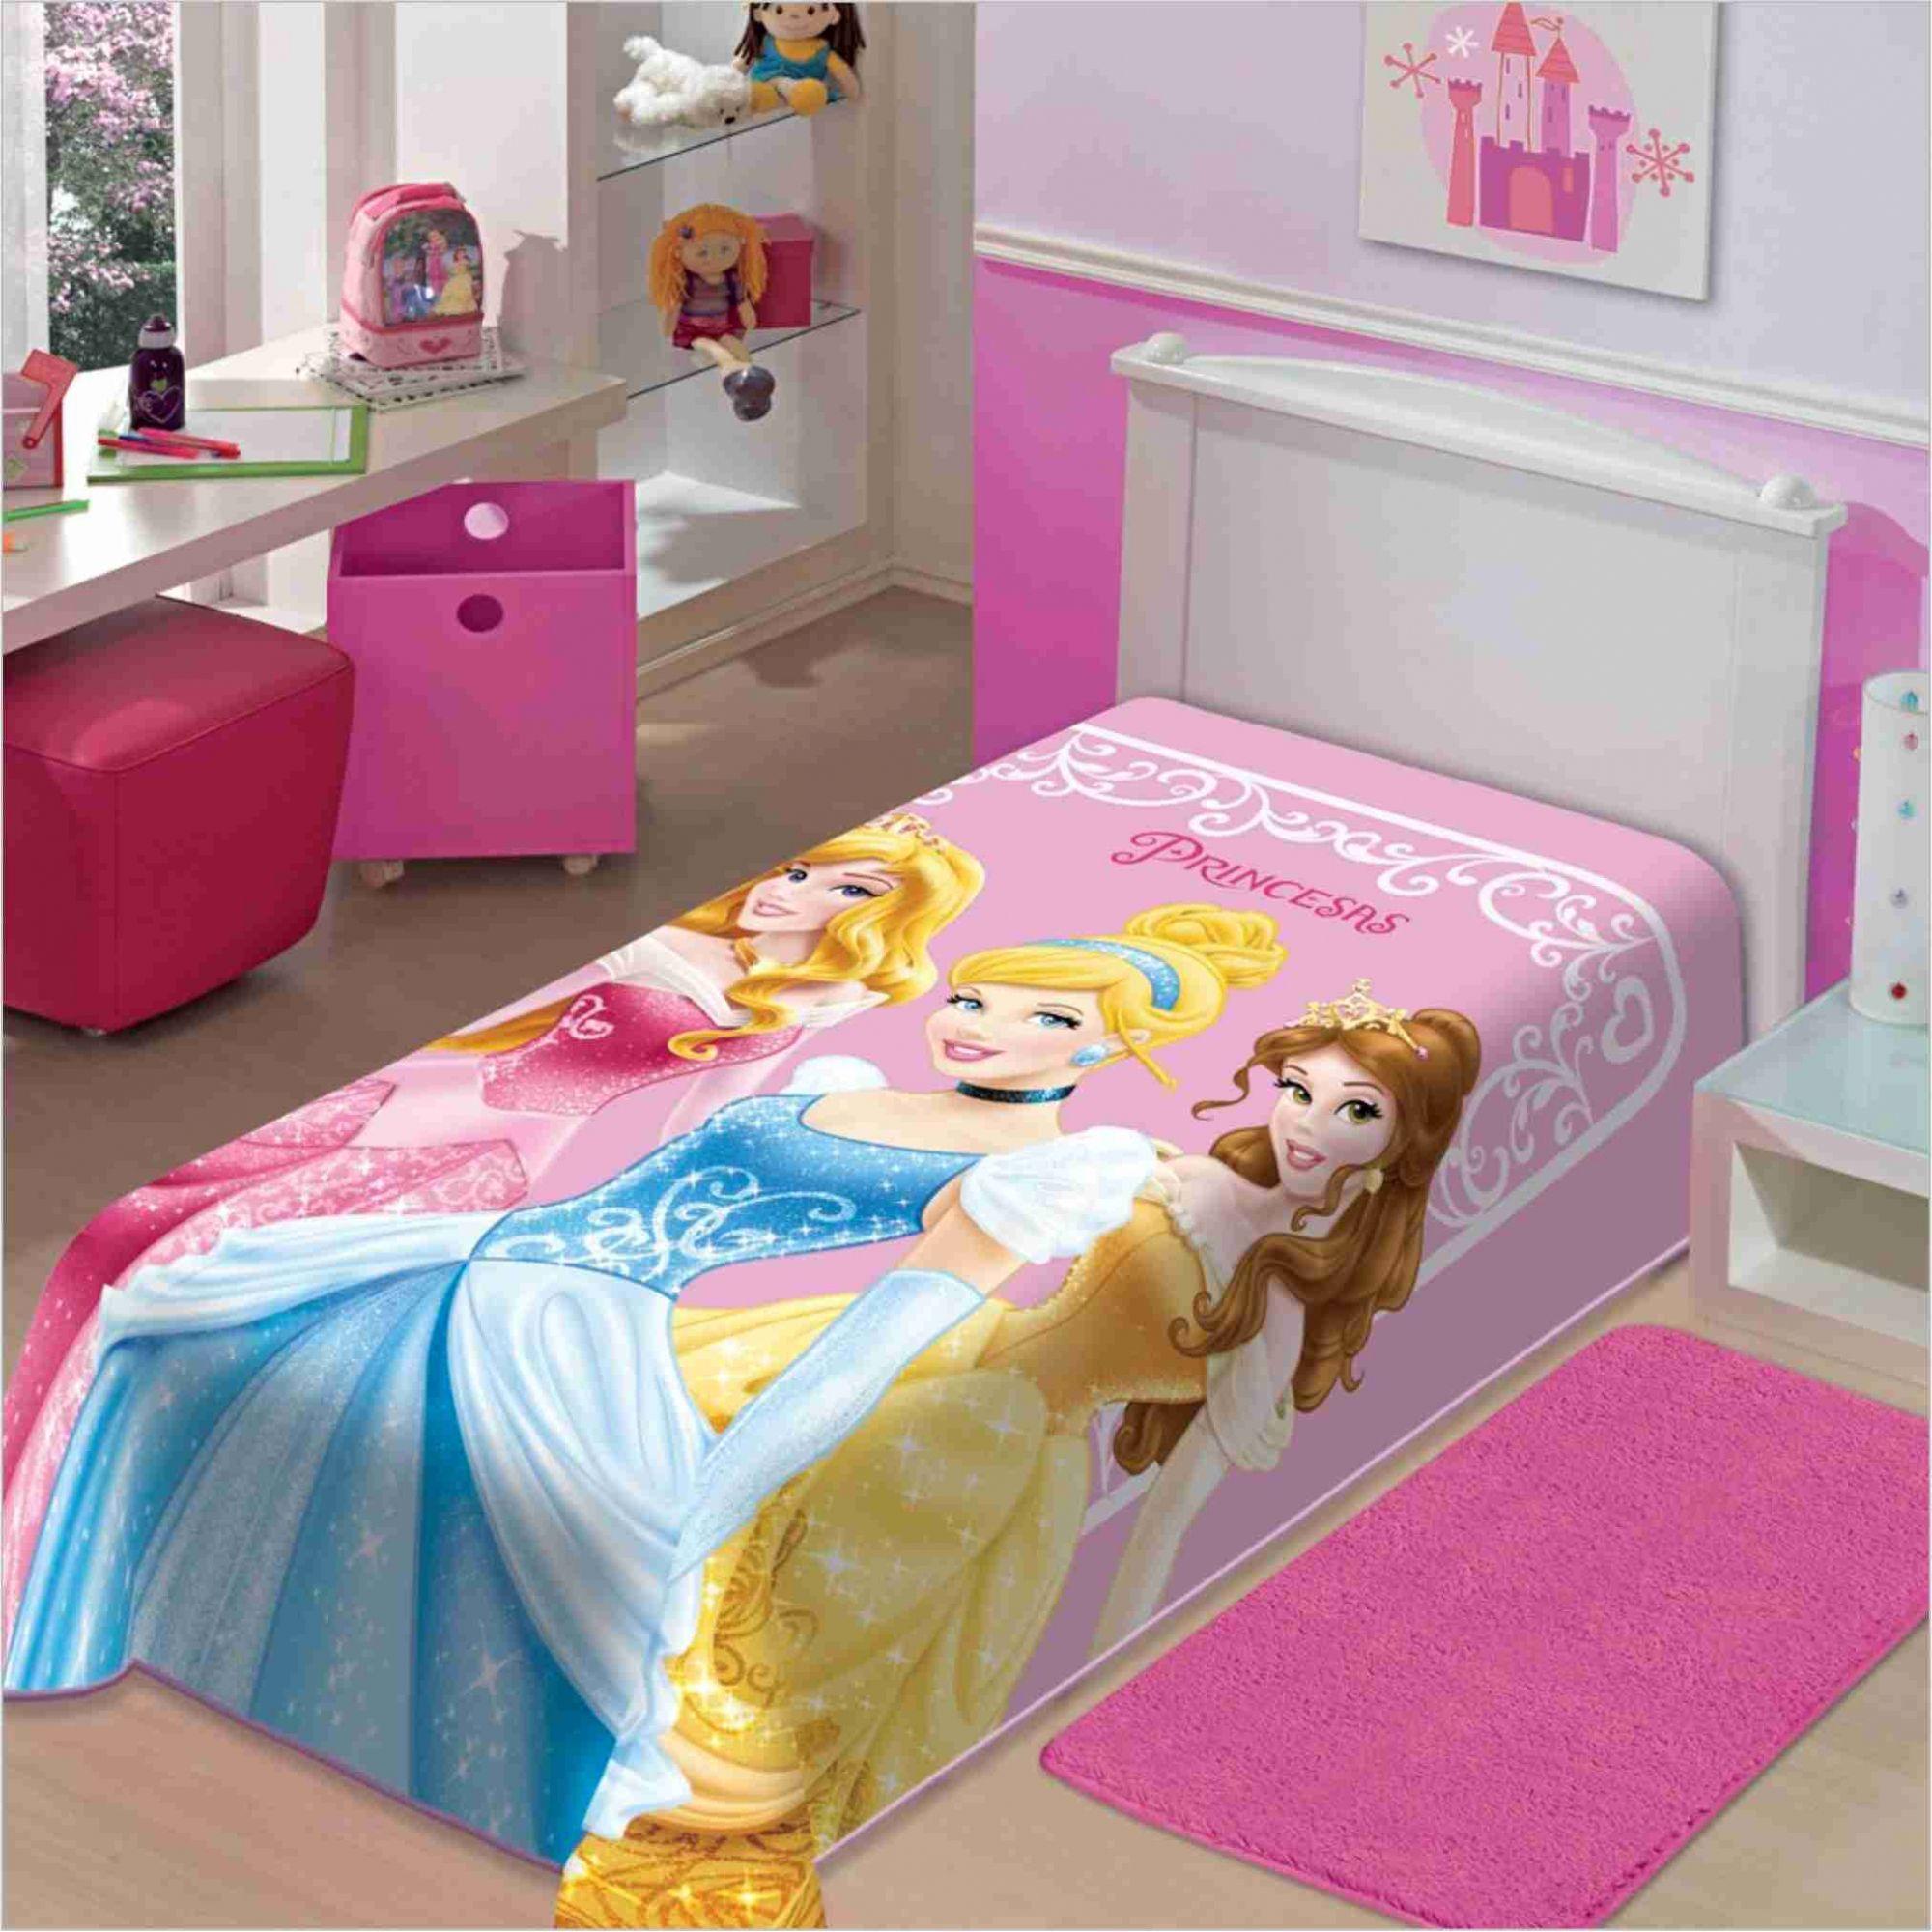 4d921f2f2c Cobertor Infantil Princesas Bela Cinderela Branca Jolitex -  PEQUENININHOS.COM